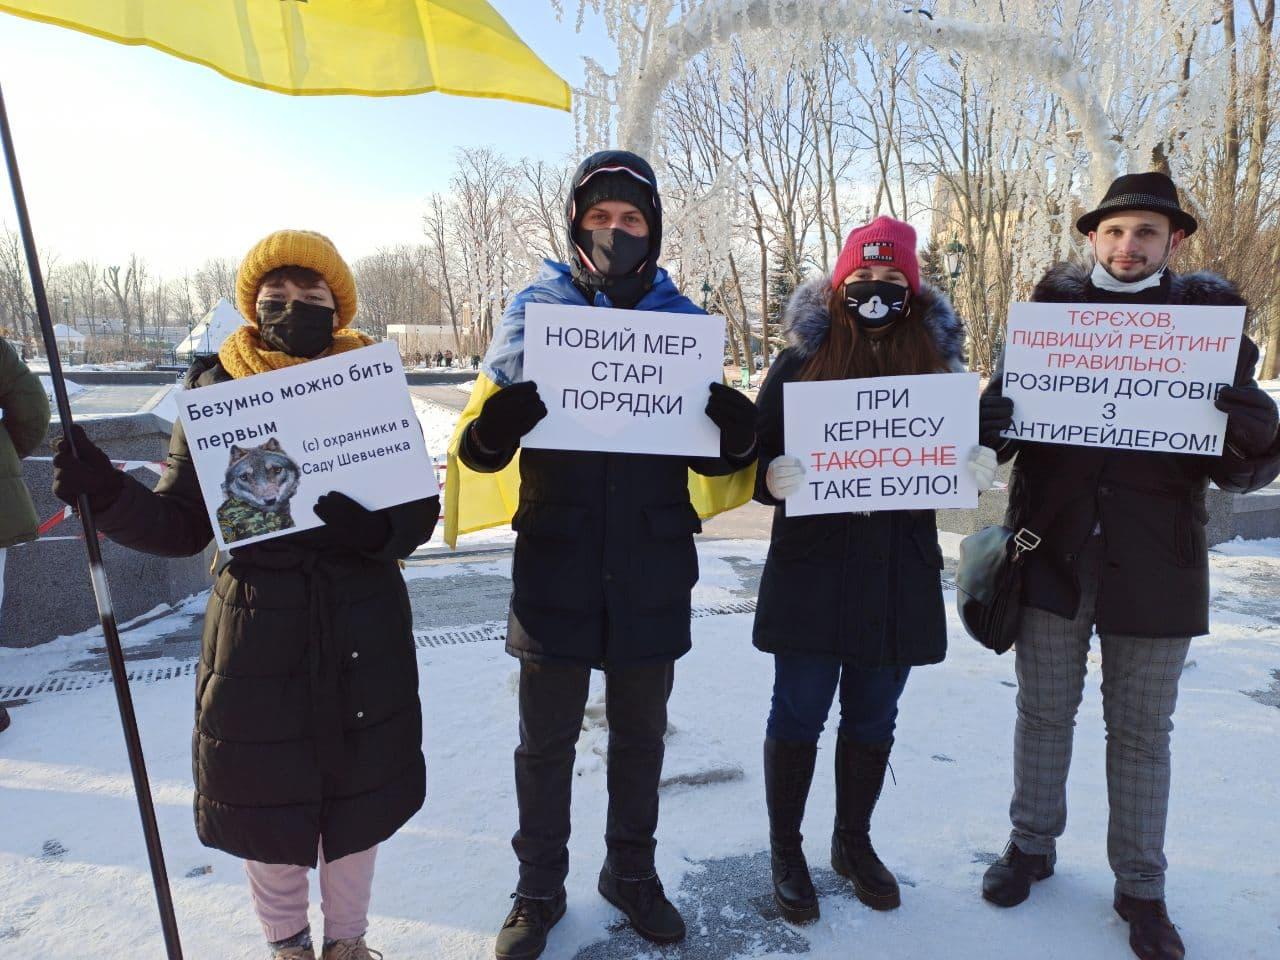 В Харькове вышли на протест из-за избиения иностранца в саду Шевченко (фото)